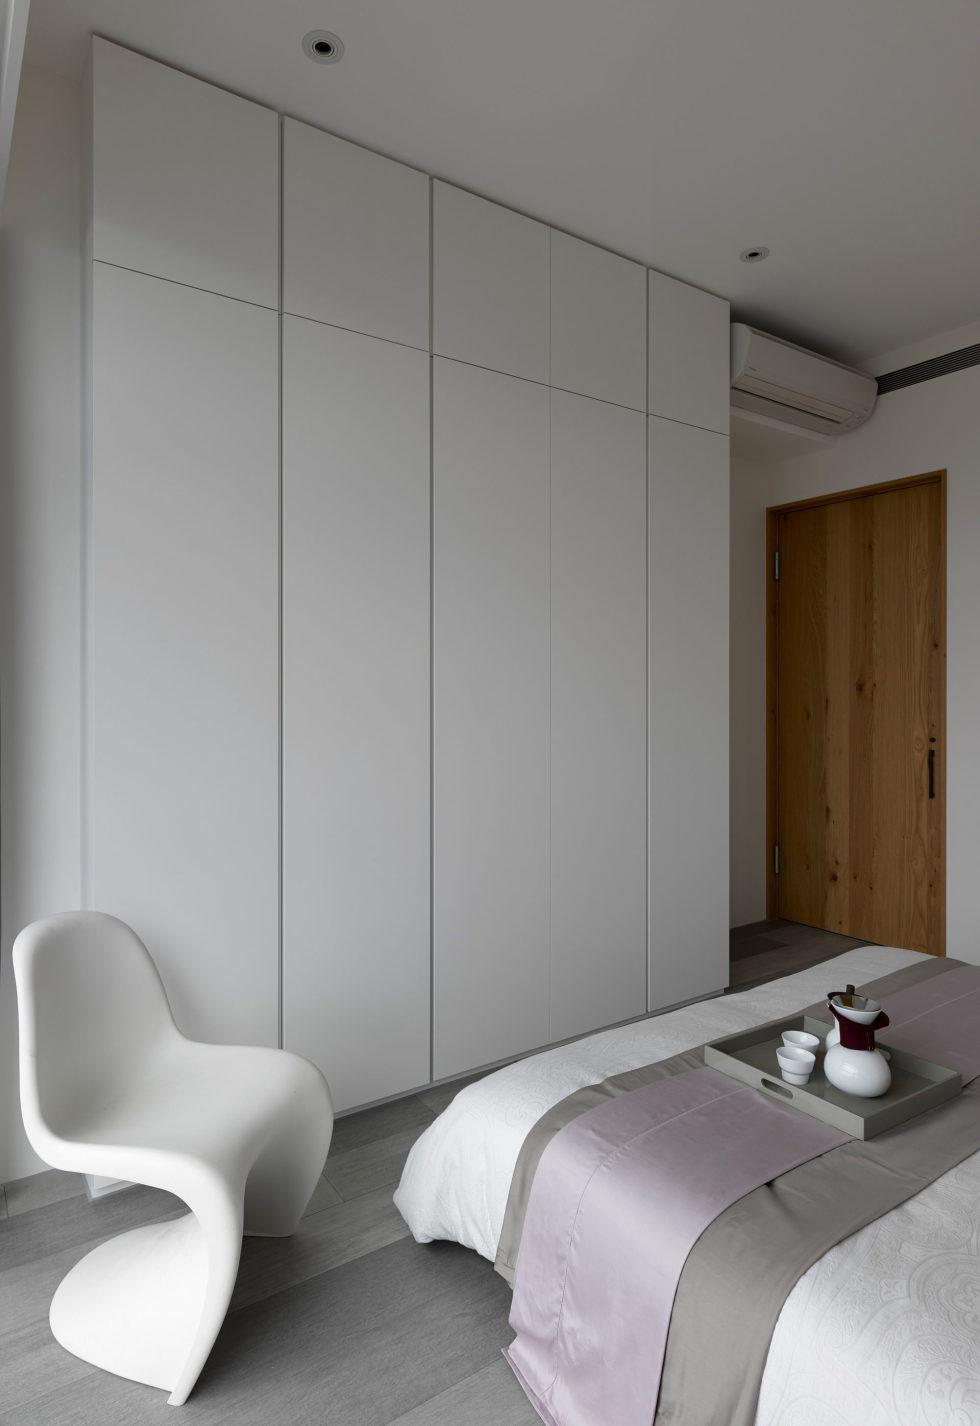 Modern Three-Room Apartment From Ganna Design Studio In Taipei, Taiwan 14